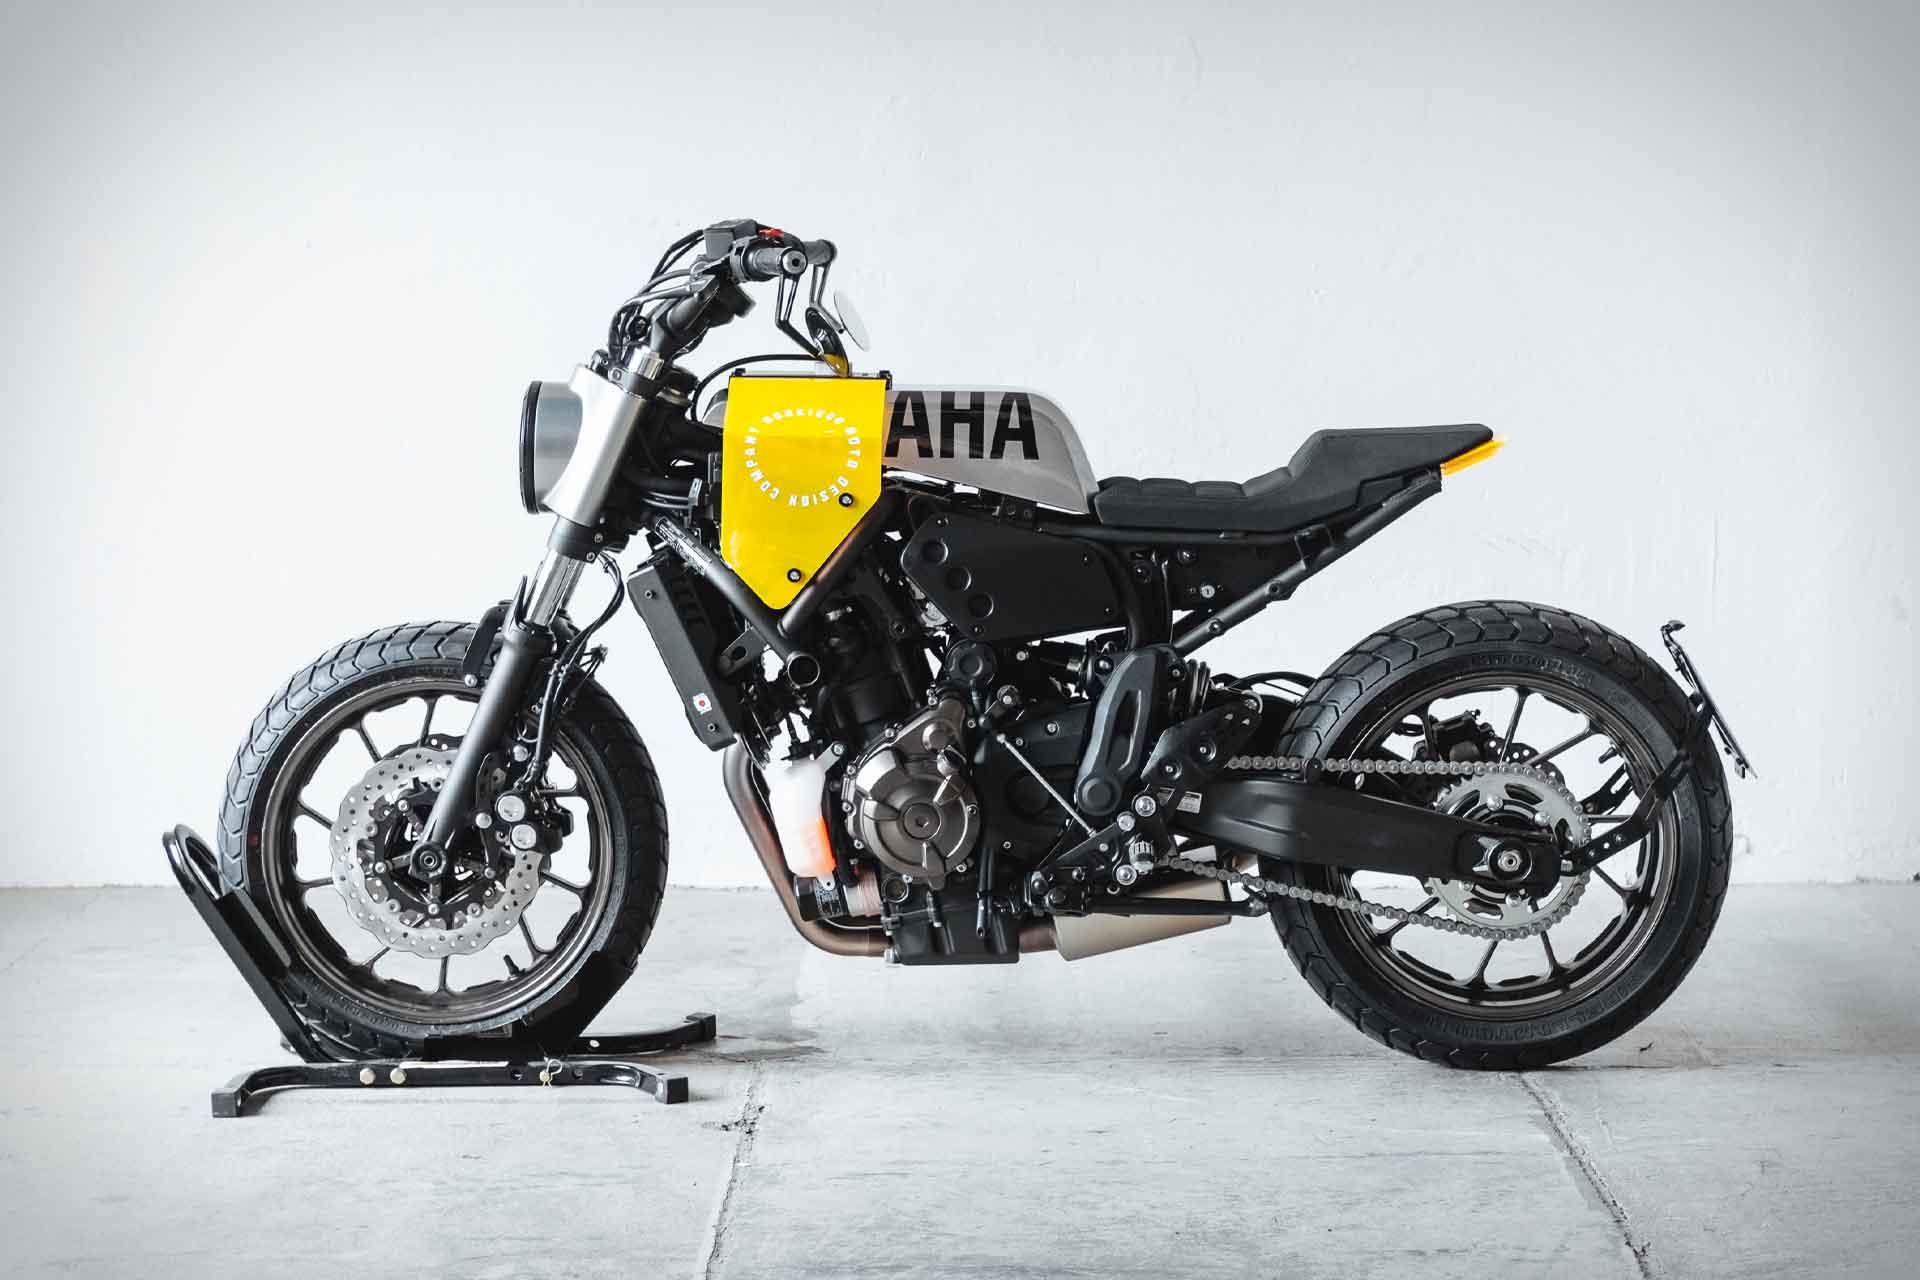 Hookie Co. Yard Built Yamaha XSR700 Motorcycle